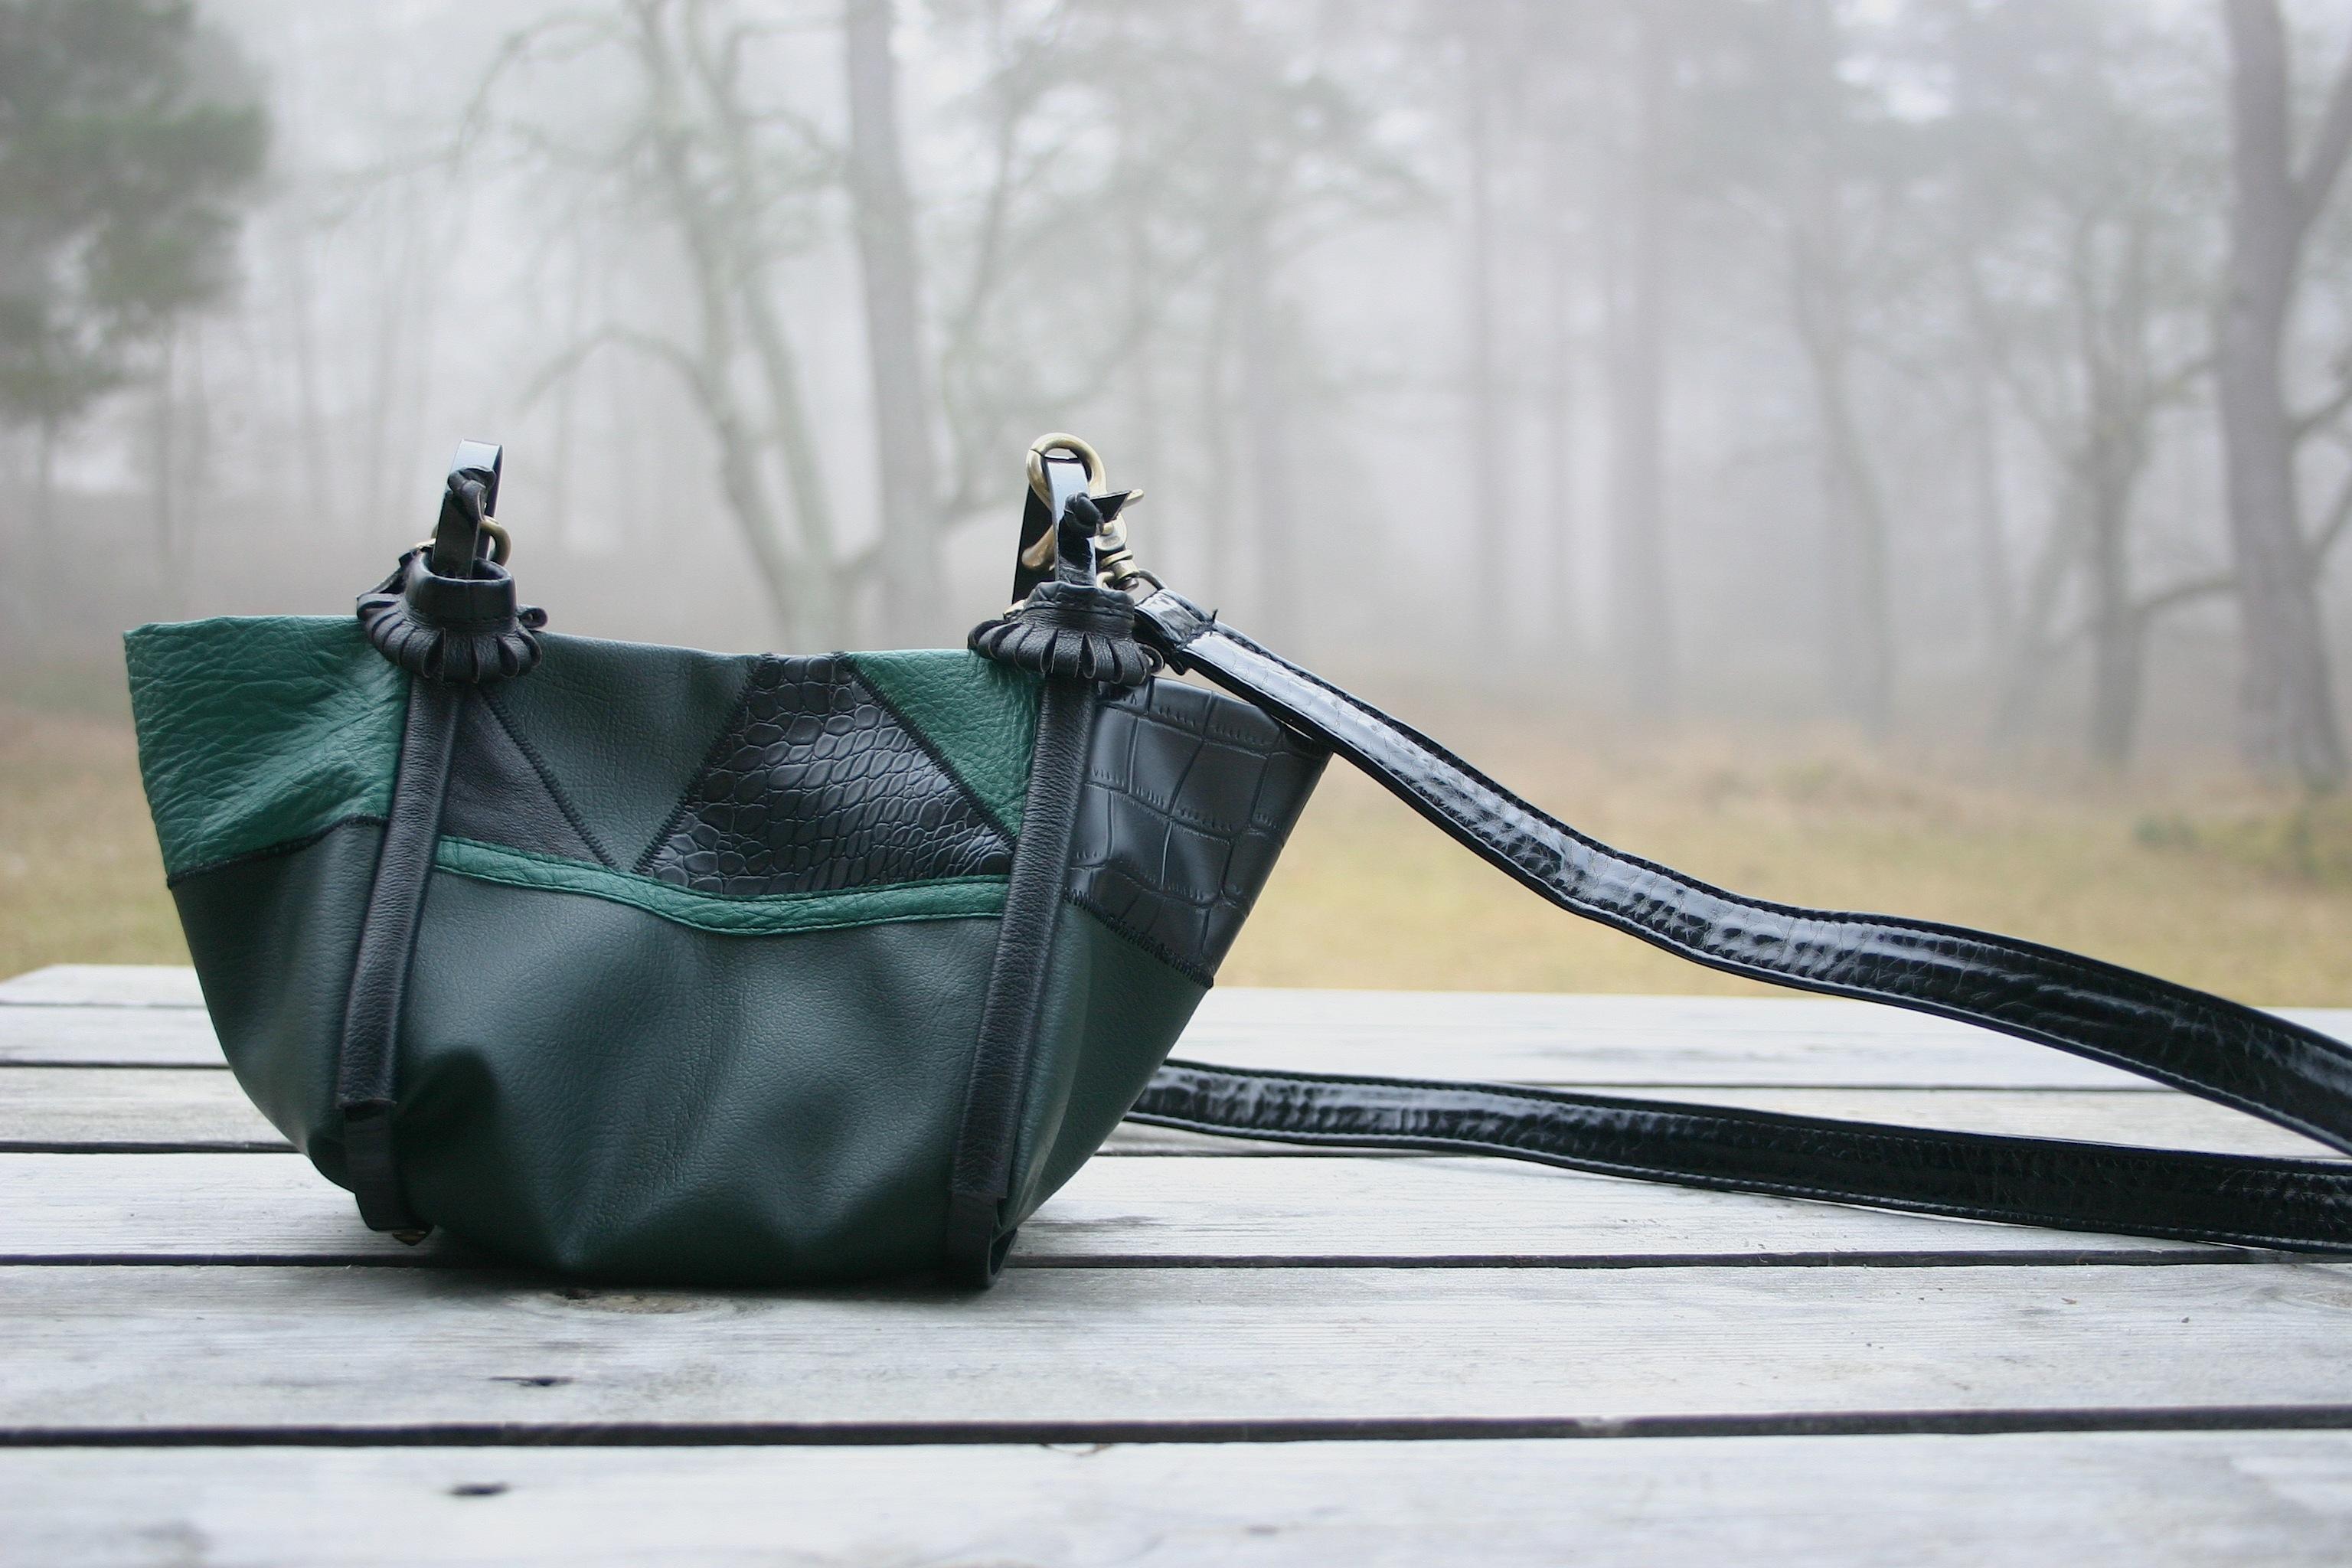 diy-greenish-leather-bag-with-cross-body-strap